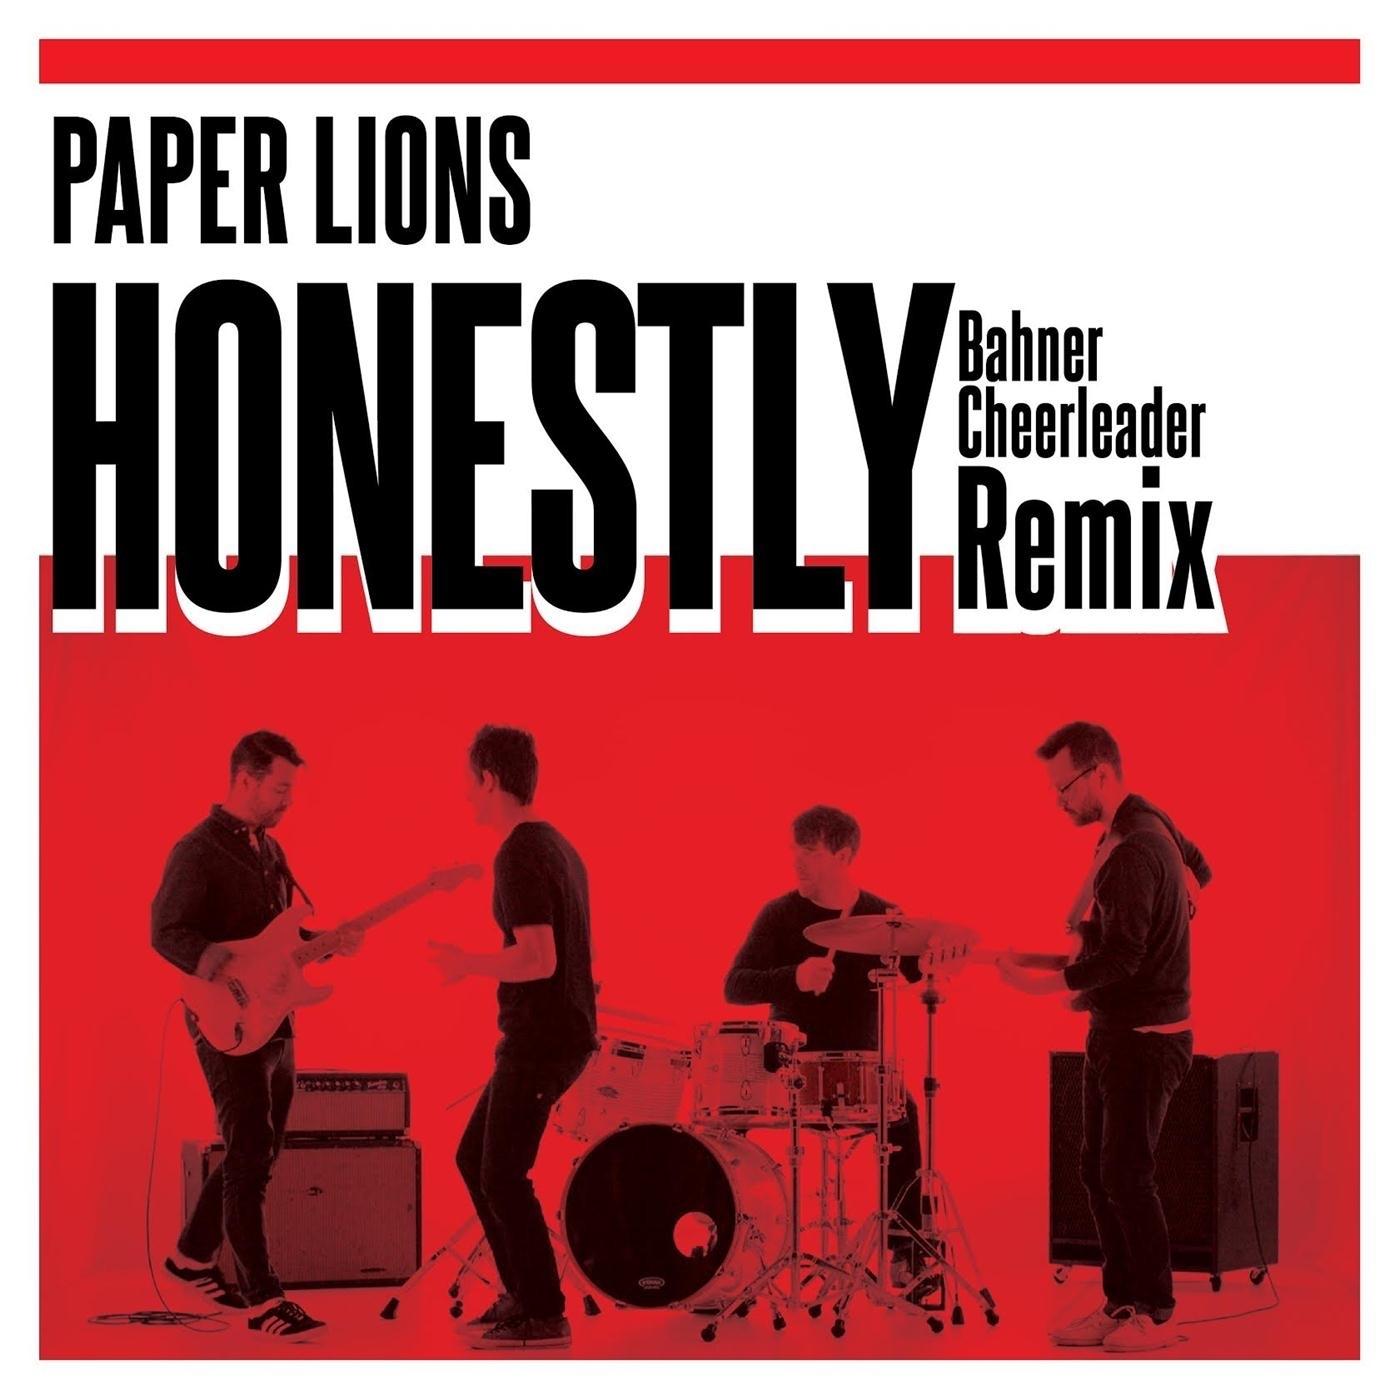 Honestly (Bahner Cheerleader Remix) - Single